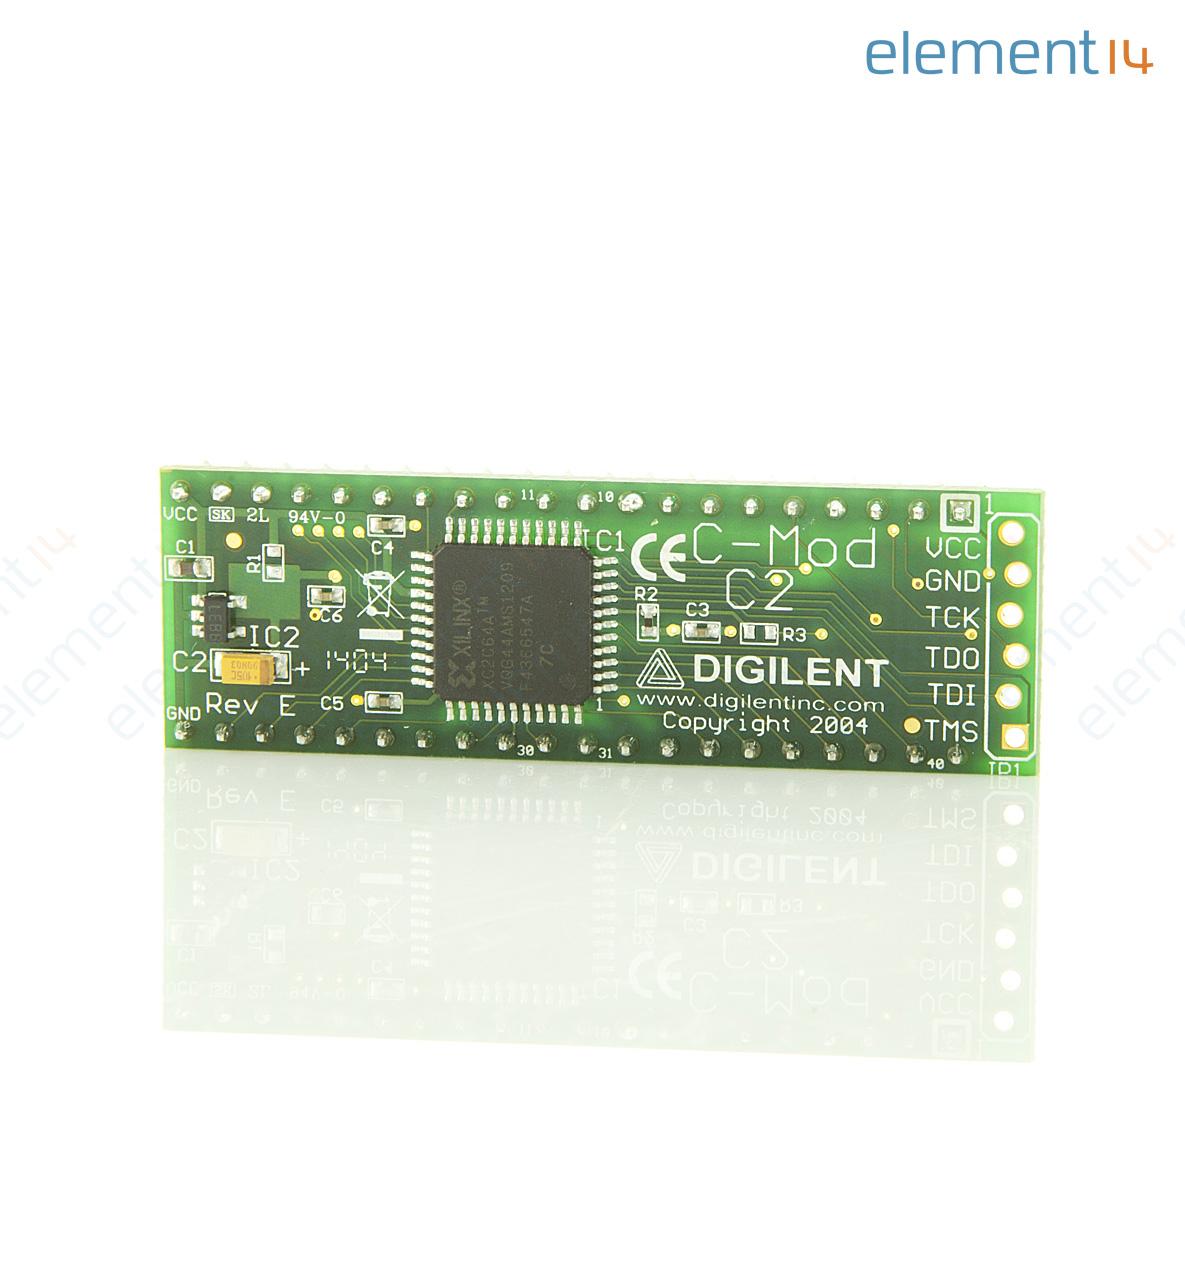 410 047 C2 Digilent Xilinx Cpld 40 Pin Dip Jtag Cable Schematic Usb C Mod Board